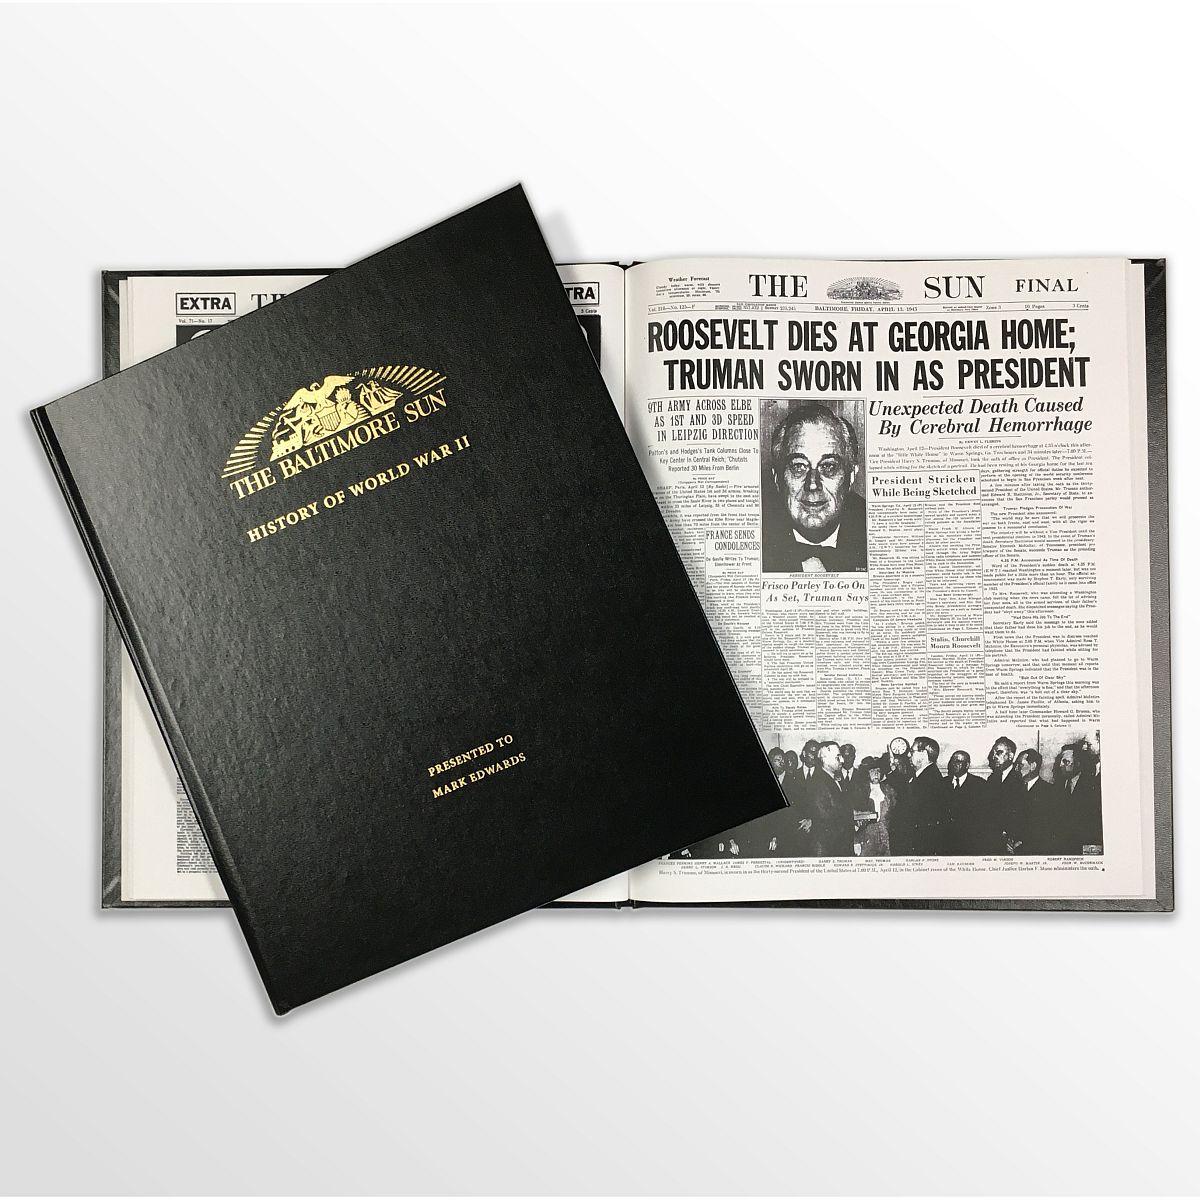 History of World War II Newspaper Book